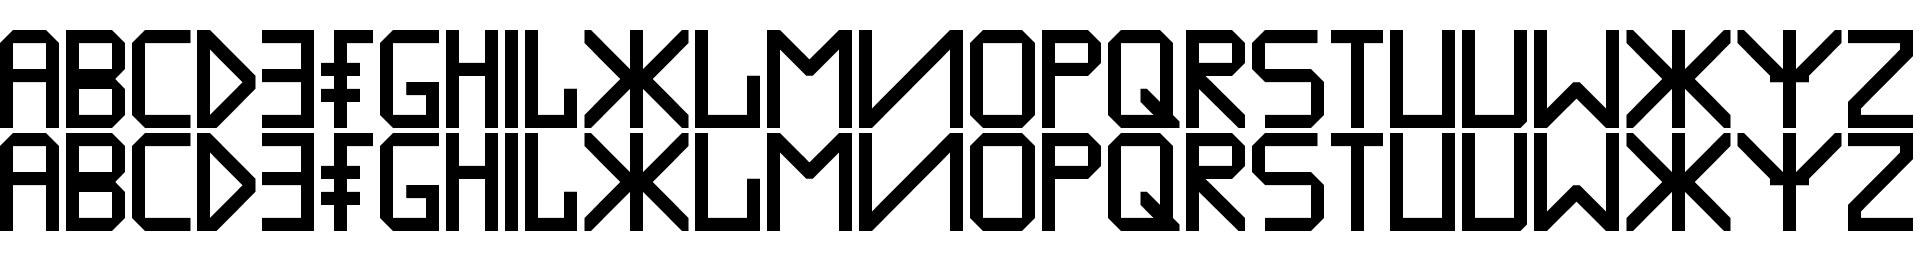 Inmodify